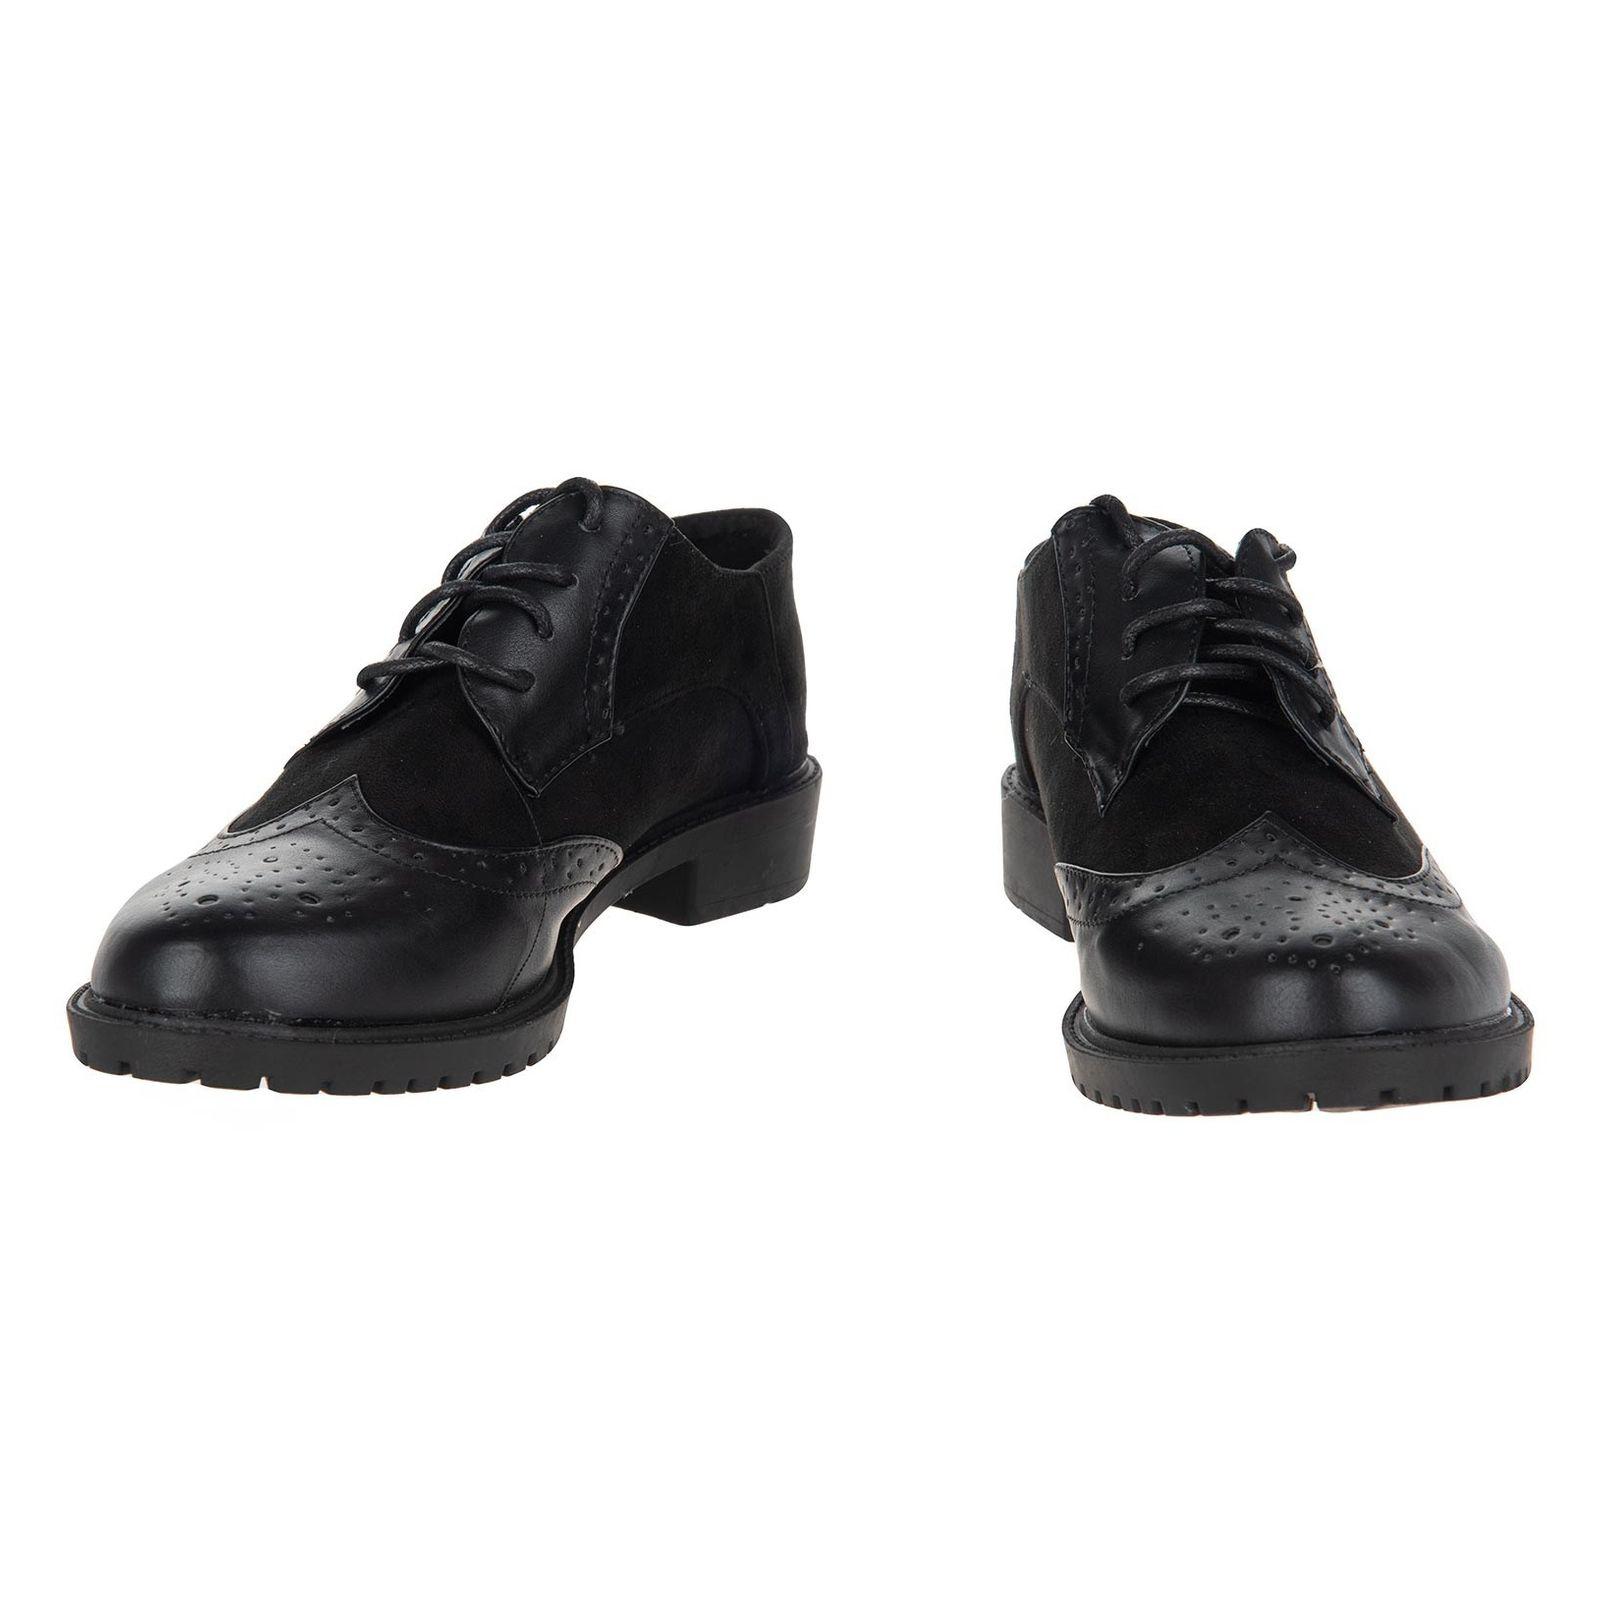 کفش تخت زنانه - مالین - مشکی - 3